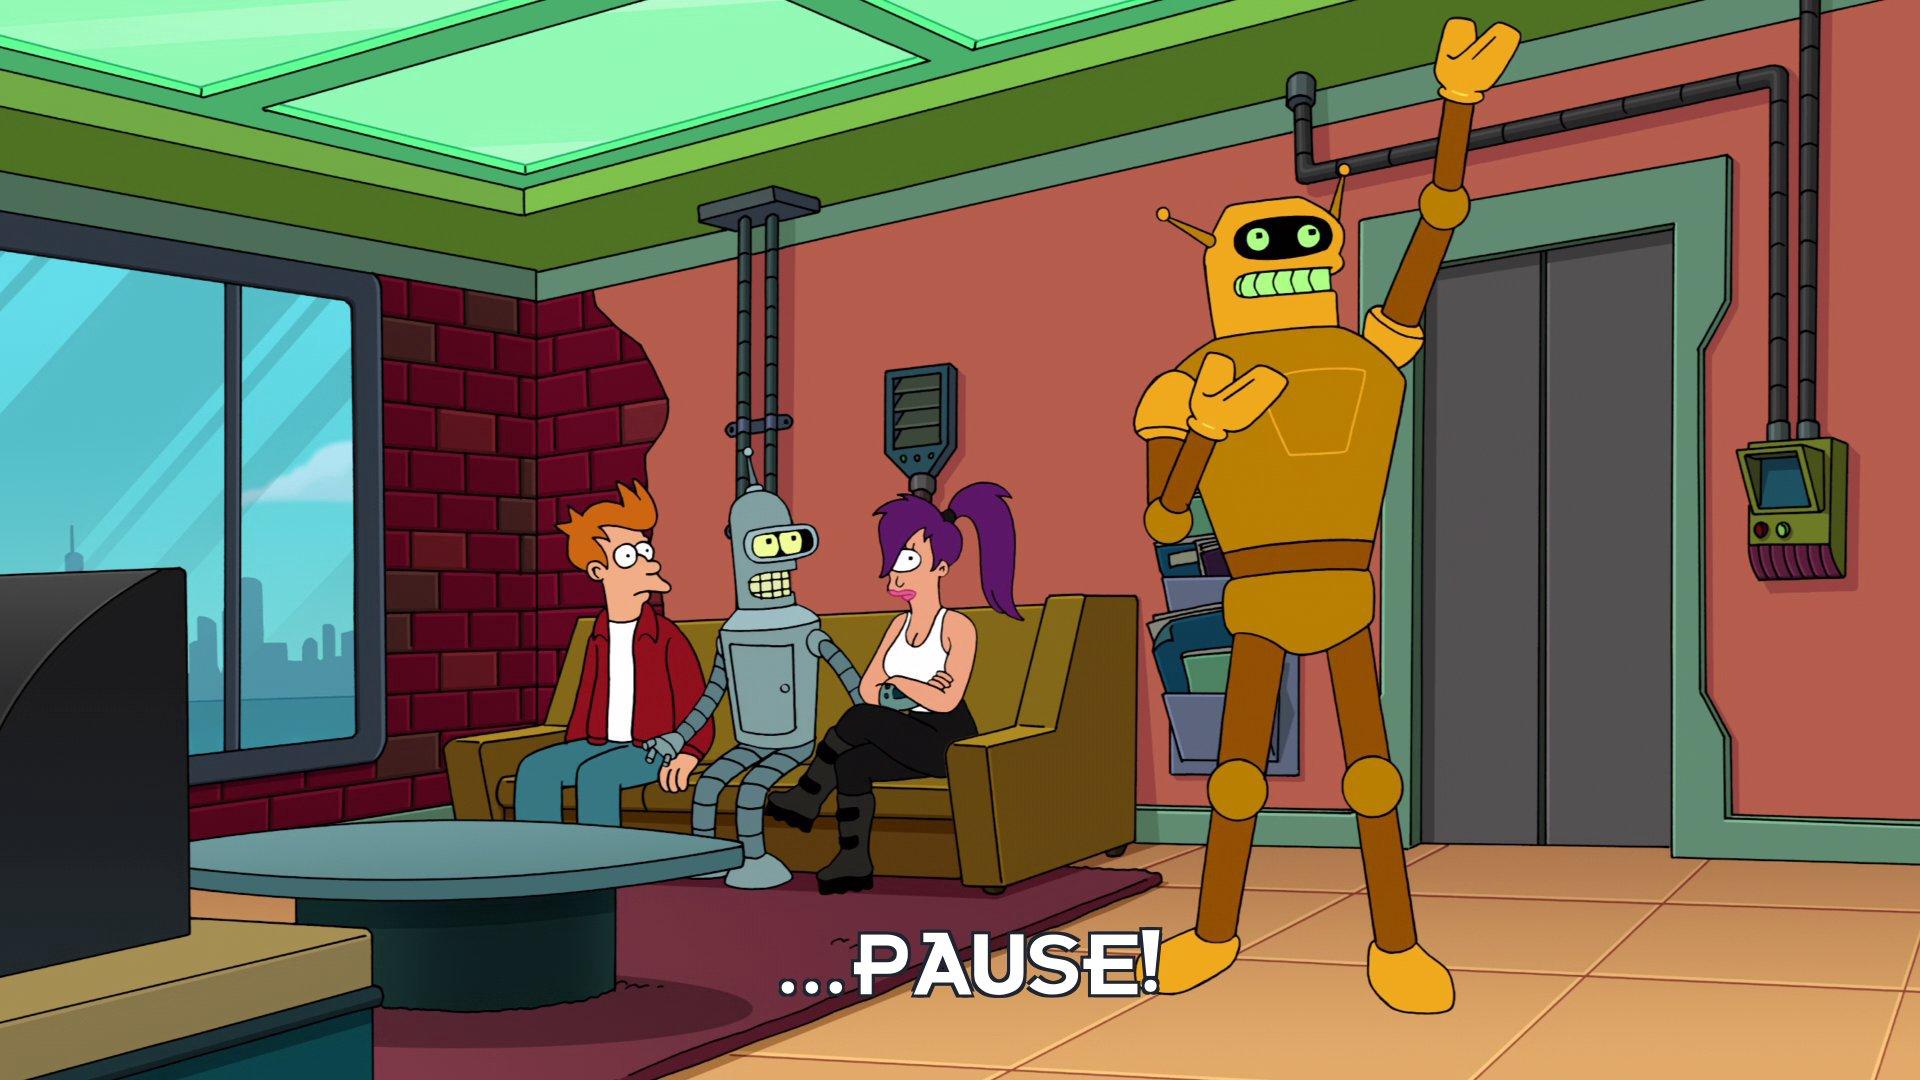 Calculon: ...pause!